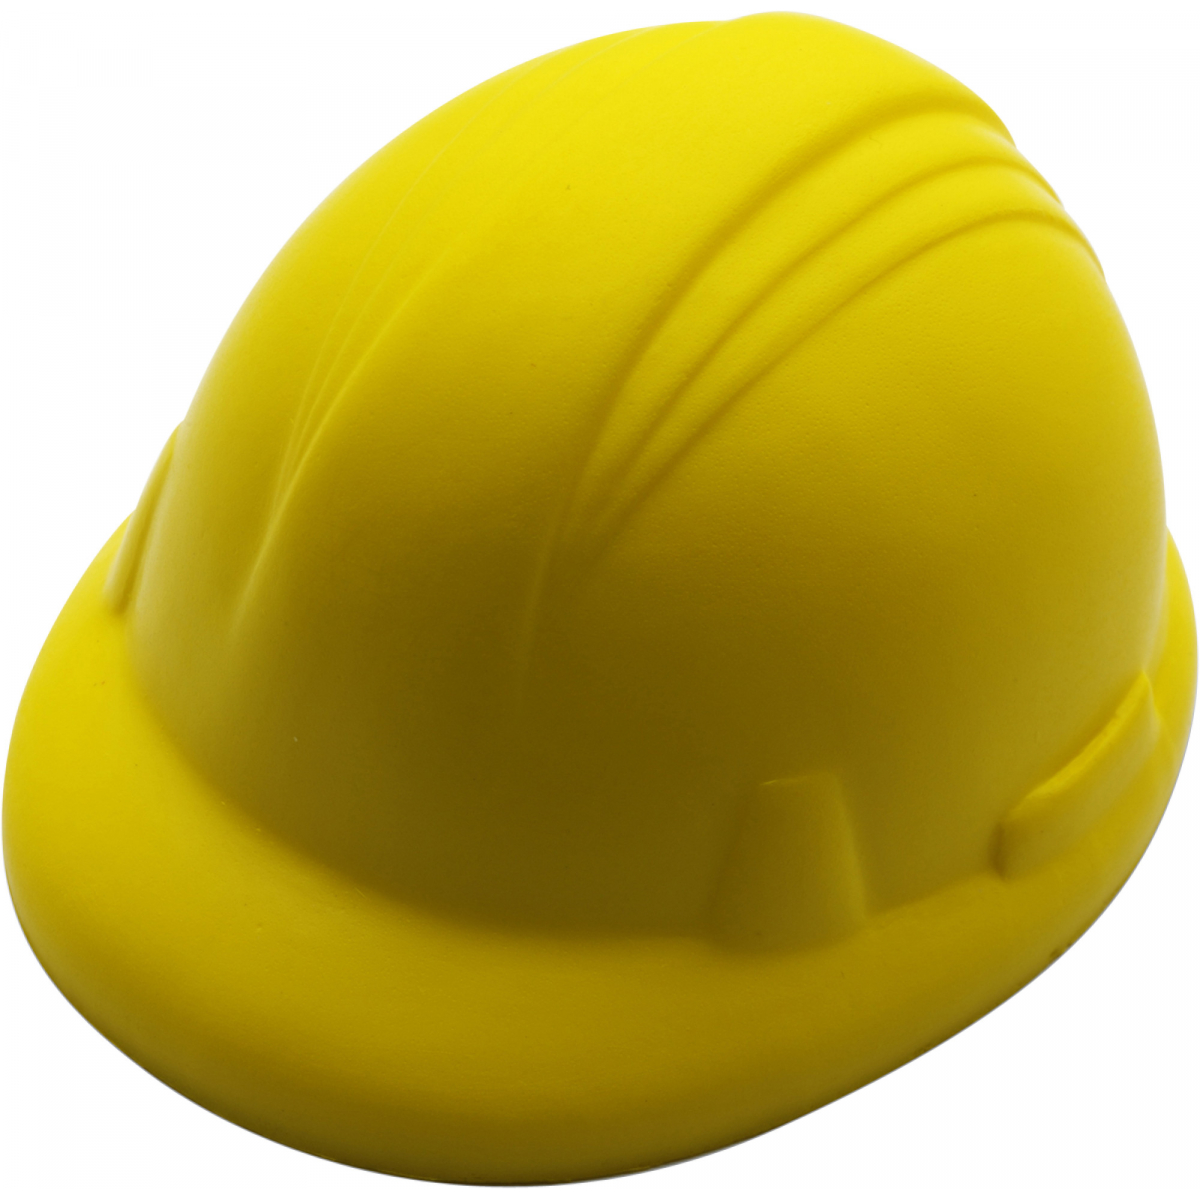 c96edd176e8 Anti-Stress bal bouw  Vanaf 0,75 per stuk   Super-snel.nl